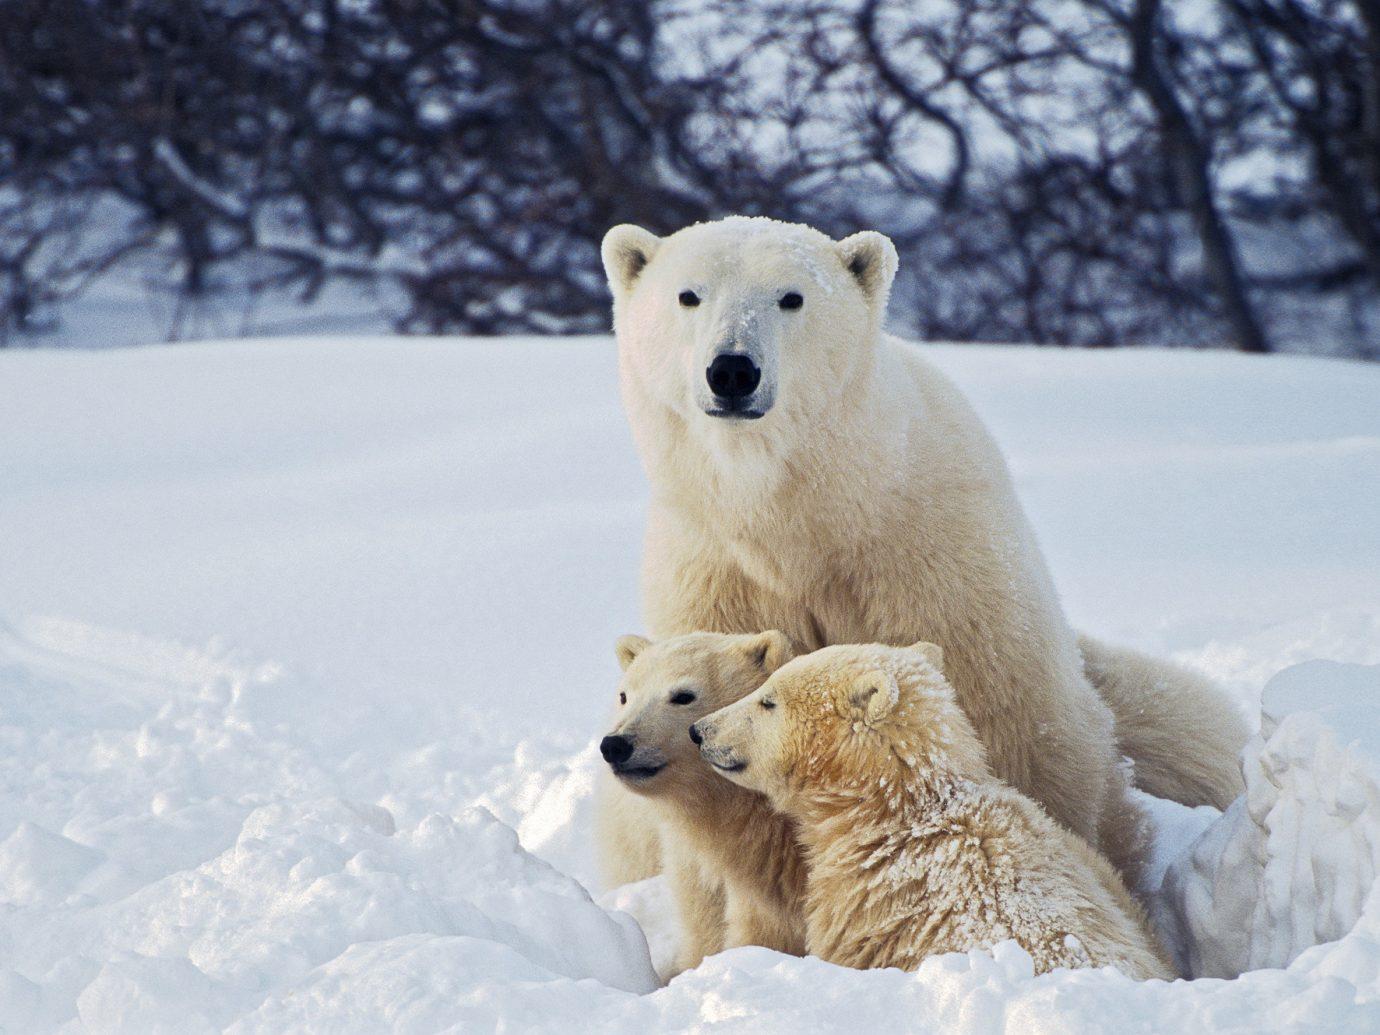 Trip Ideas snow bear outdoor tree animal mammal vertebrate polar Winter arctic weather dog breed group polar bear season greenland dog